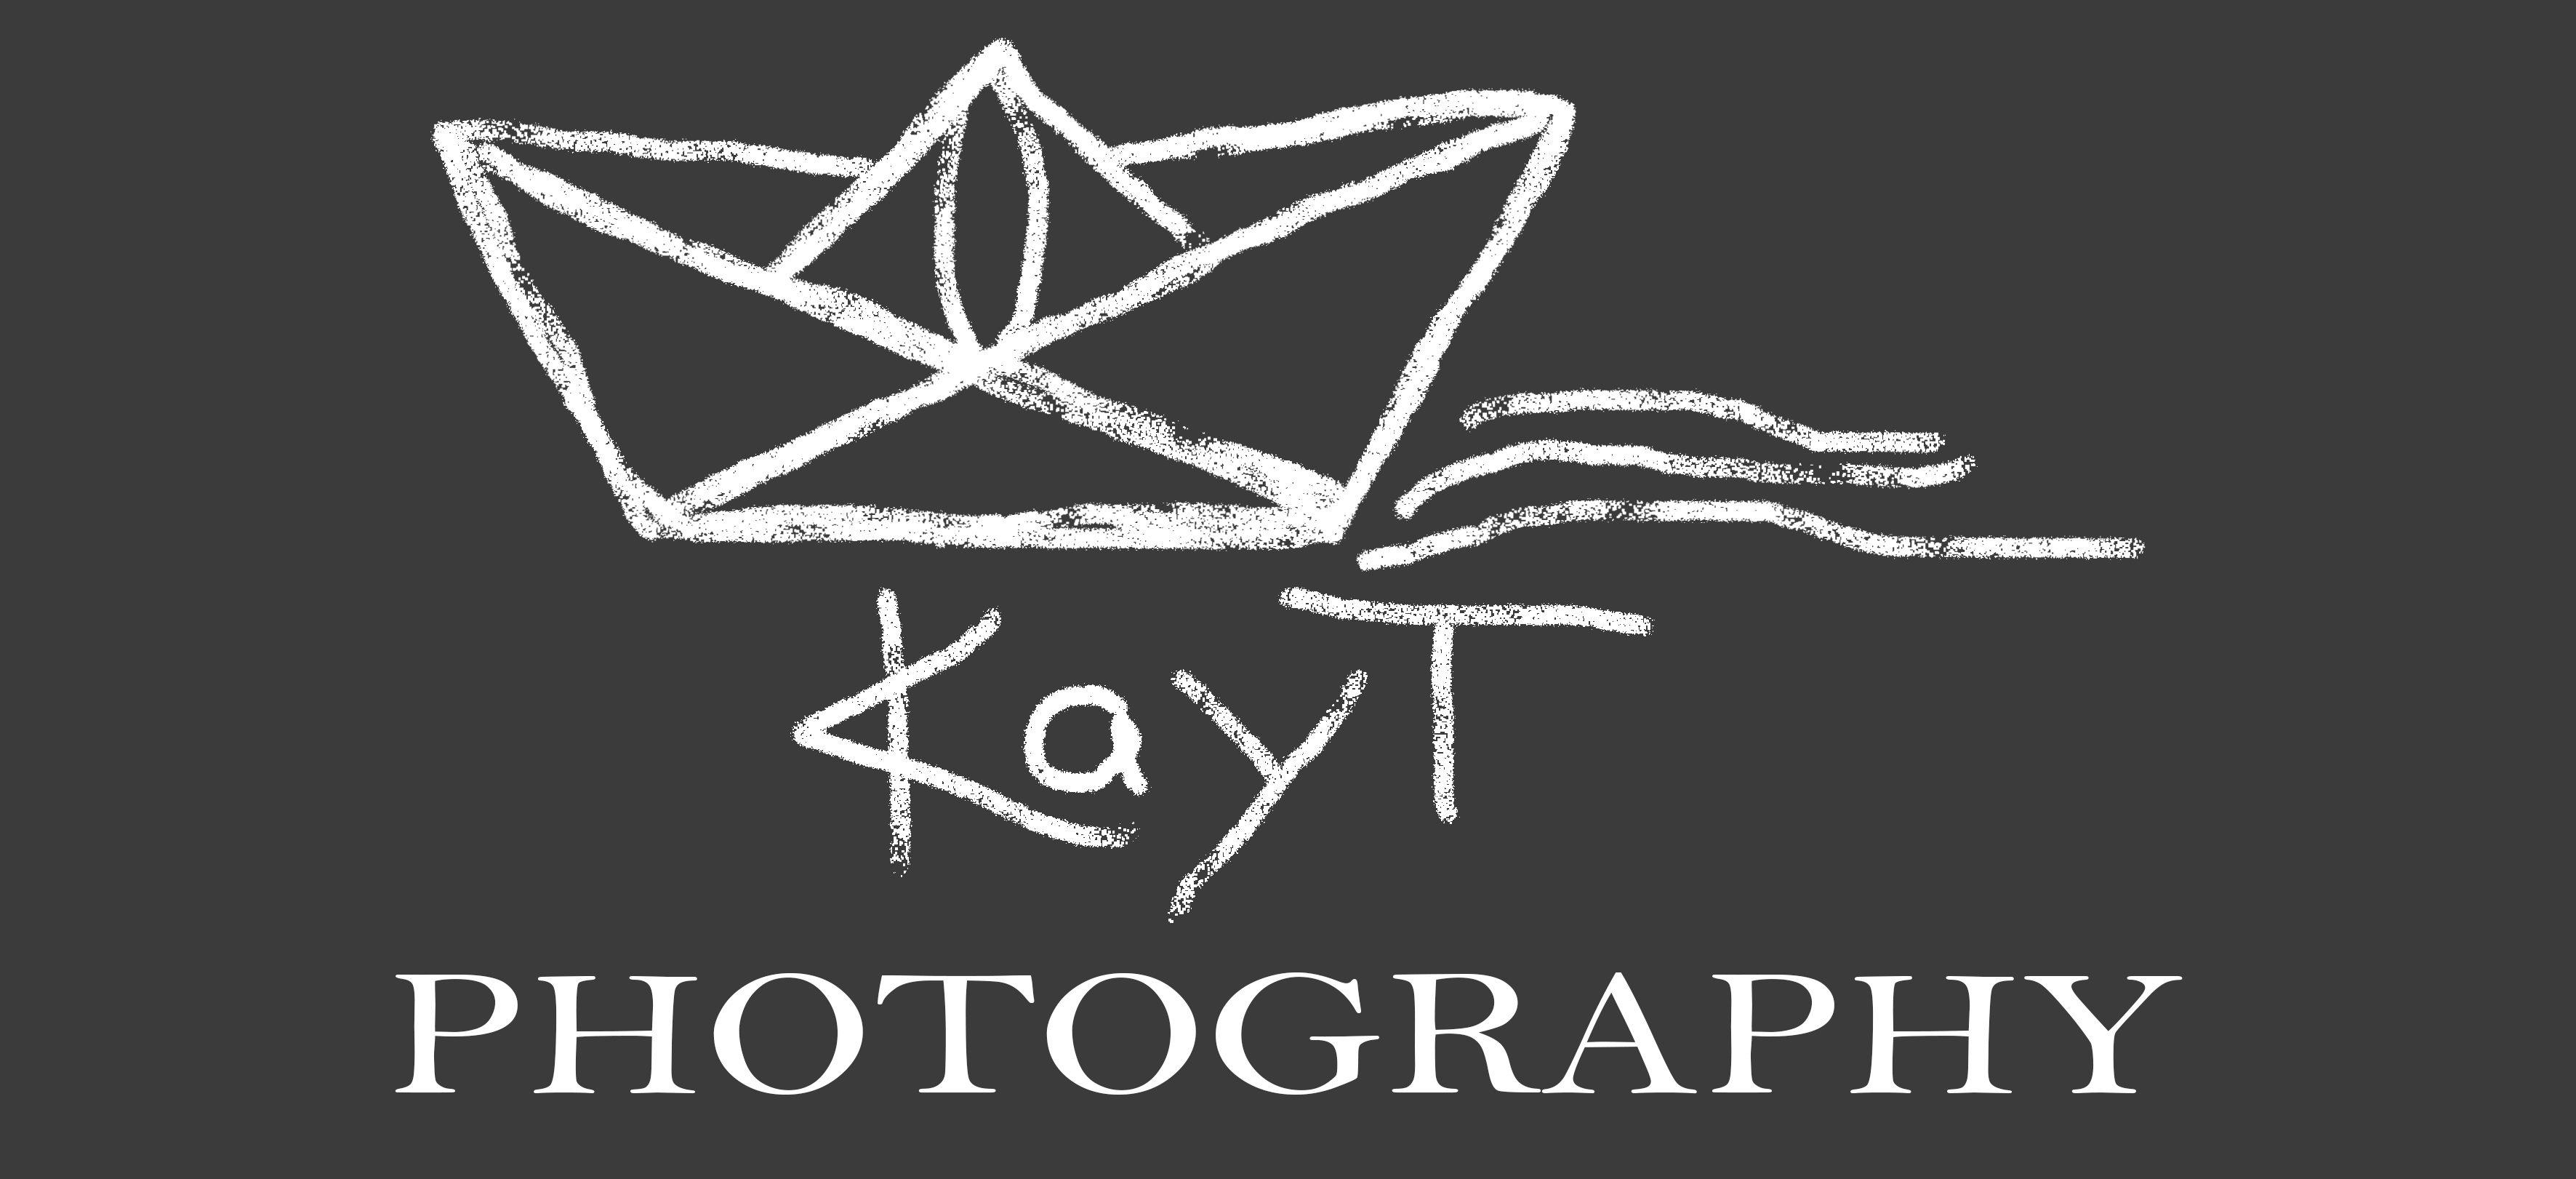 Kayt photography